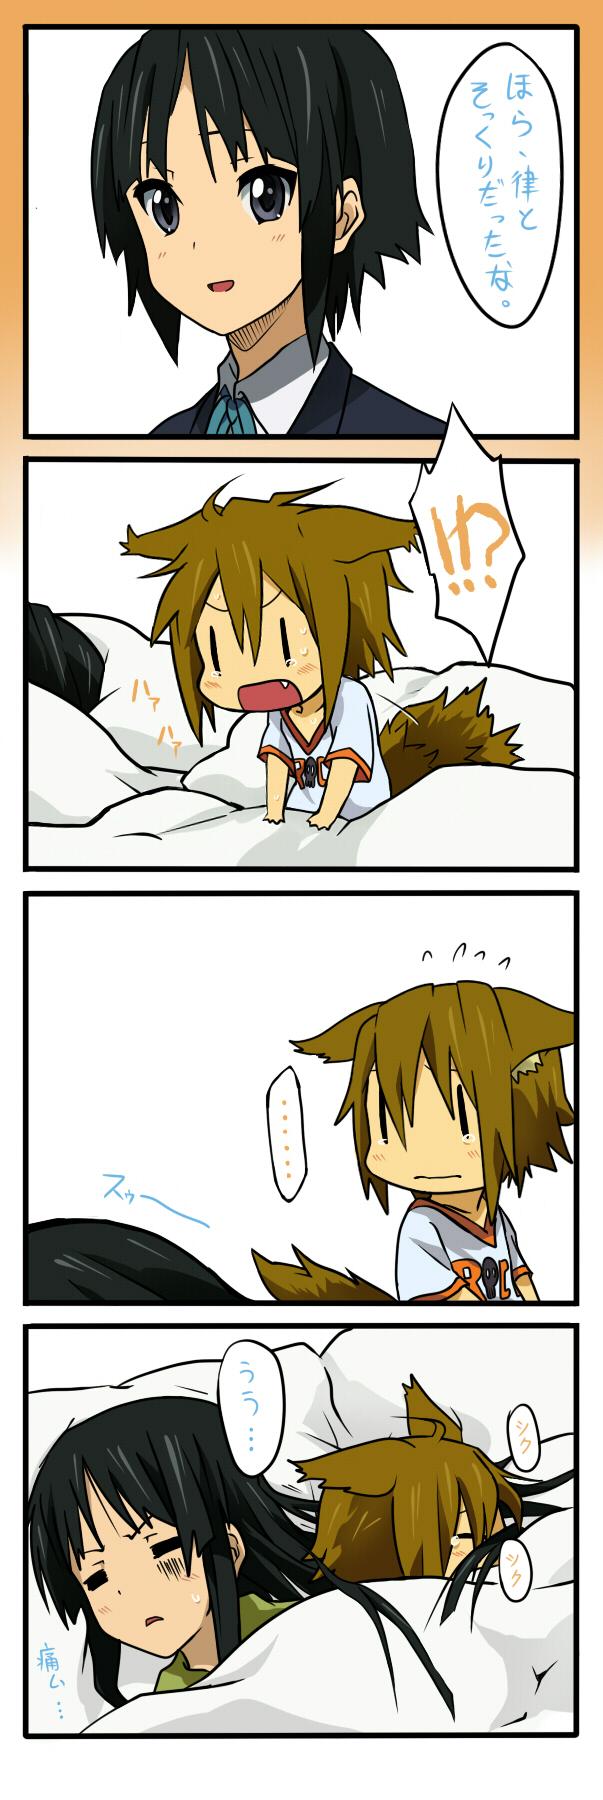 Tags: Anime, Pixiv Id 595029, K-ON!, Akiyama Mio, Tainaka Ritsu, Nightmare, Translation Request